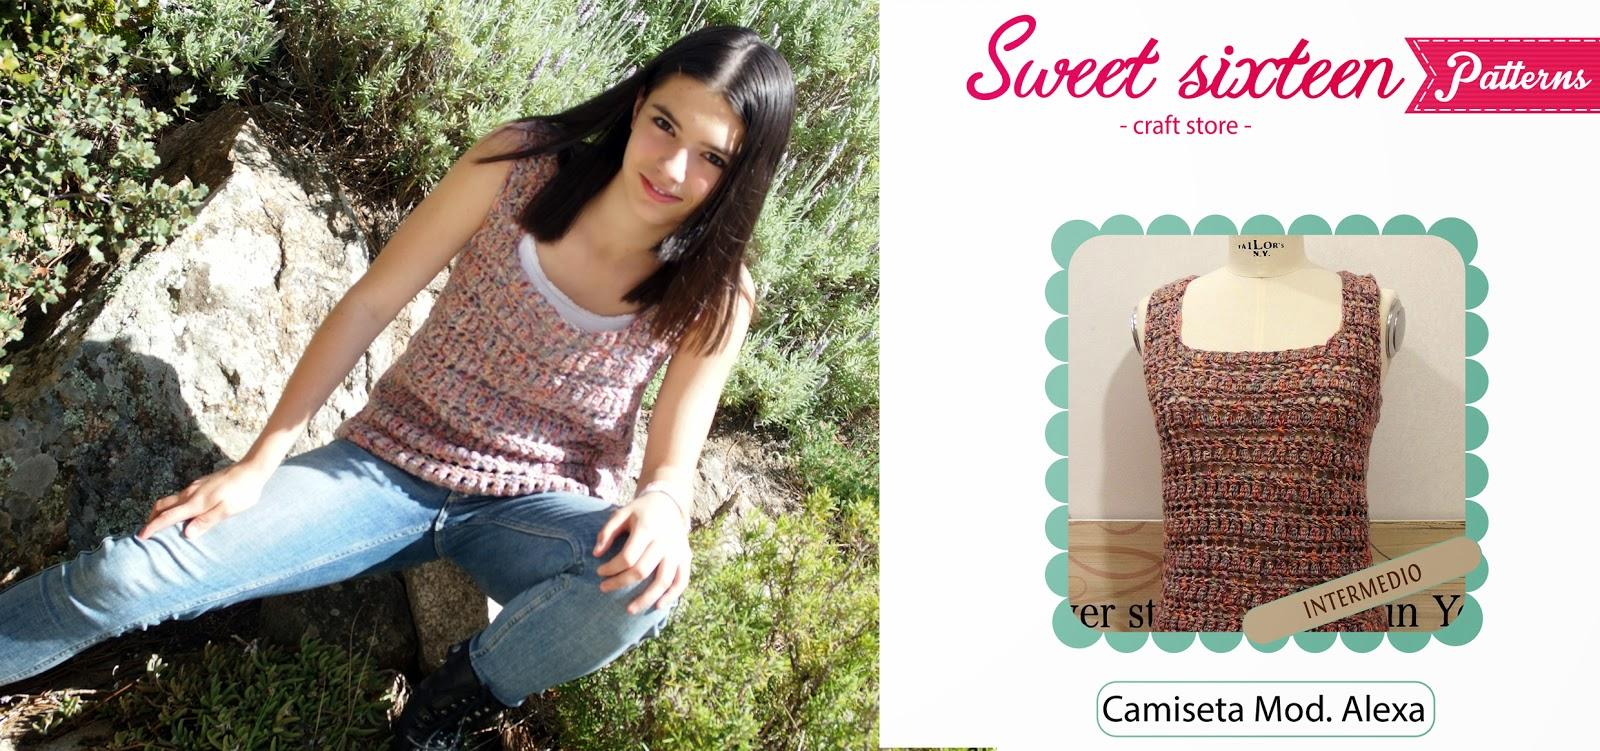 http://sweetsixteen.bigcartel.com/product/patron-chaleco-ganchillo-modelo-alexa